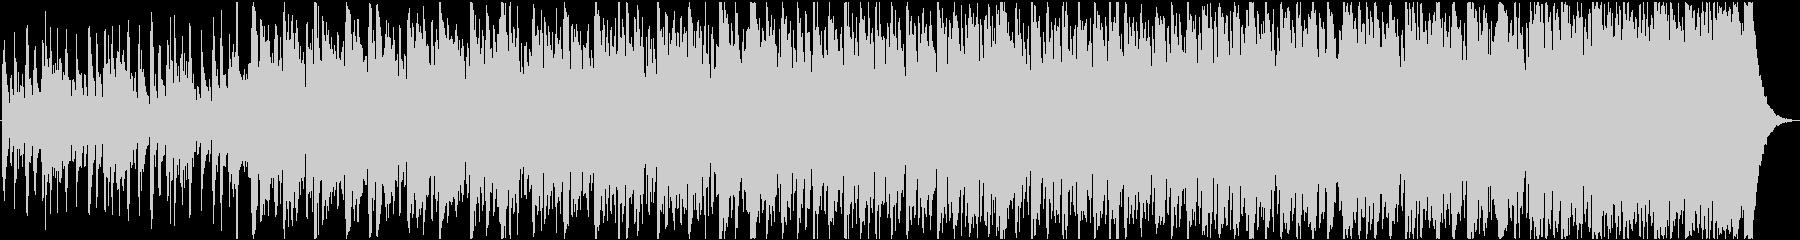 Cartoon music's unreproduced waveform